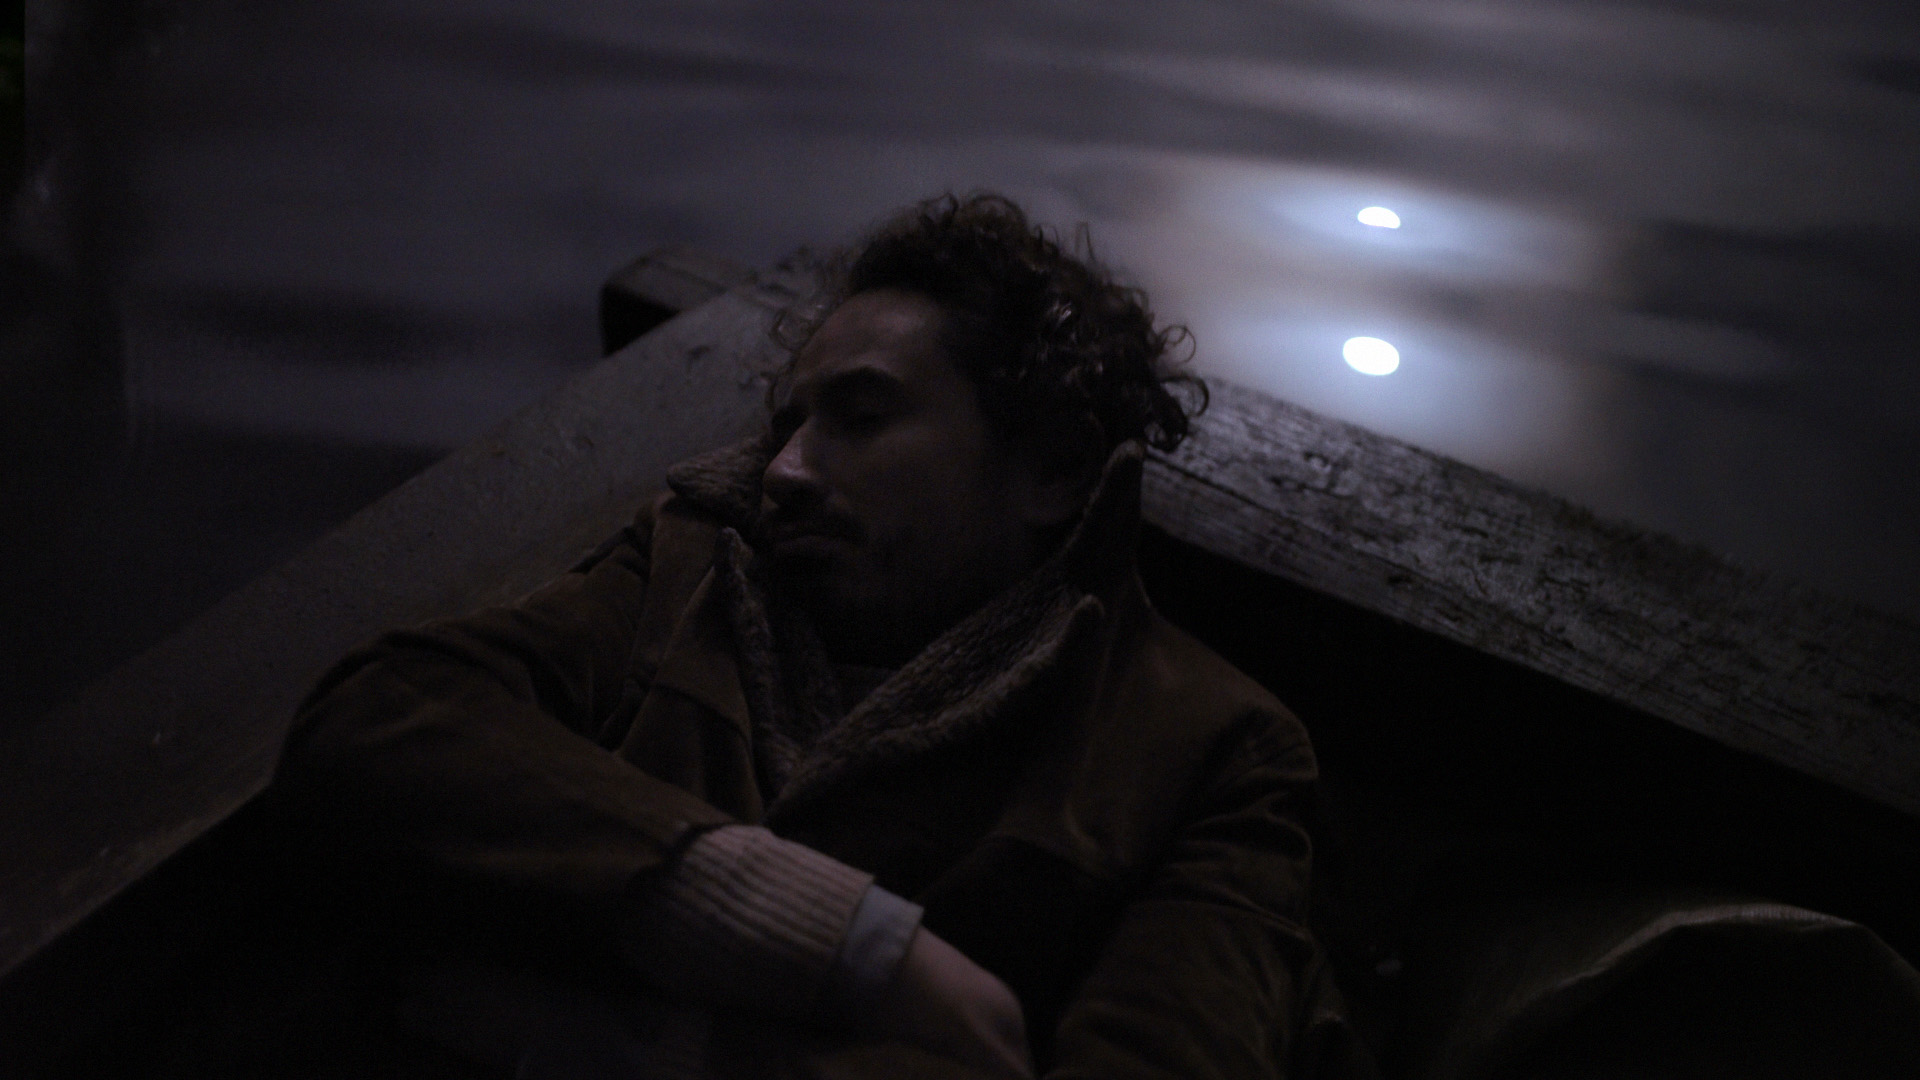 Festival de Mar del Plata 2019: crítica de «Longa Noite», de Eloy Enciso